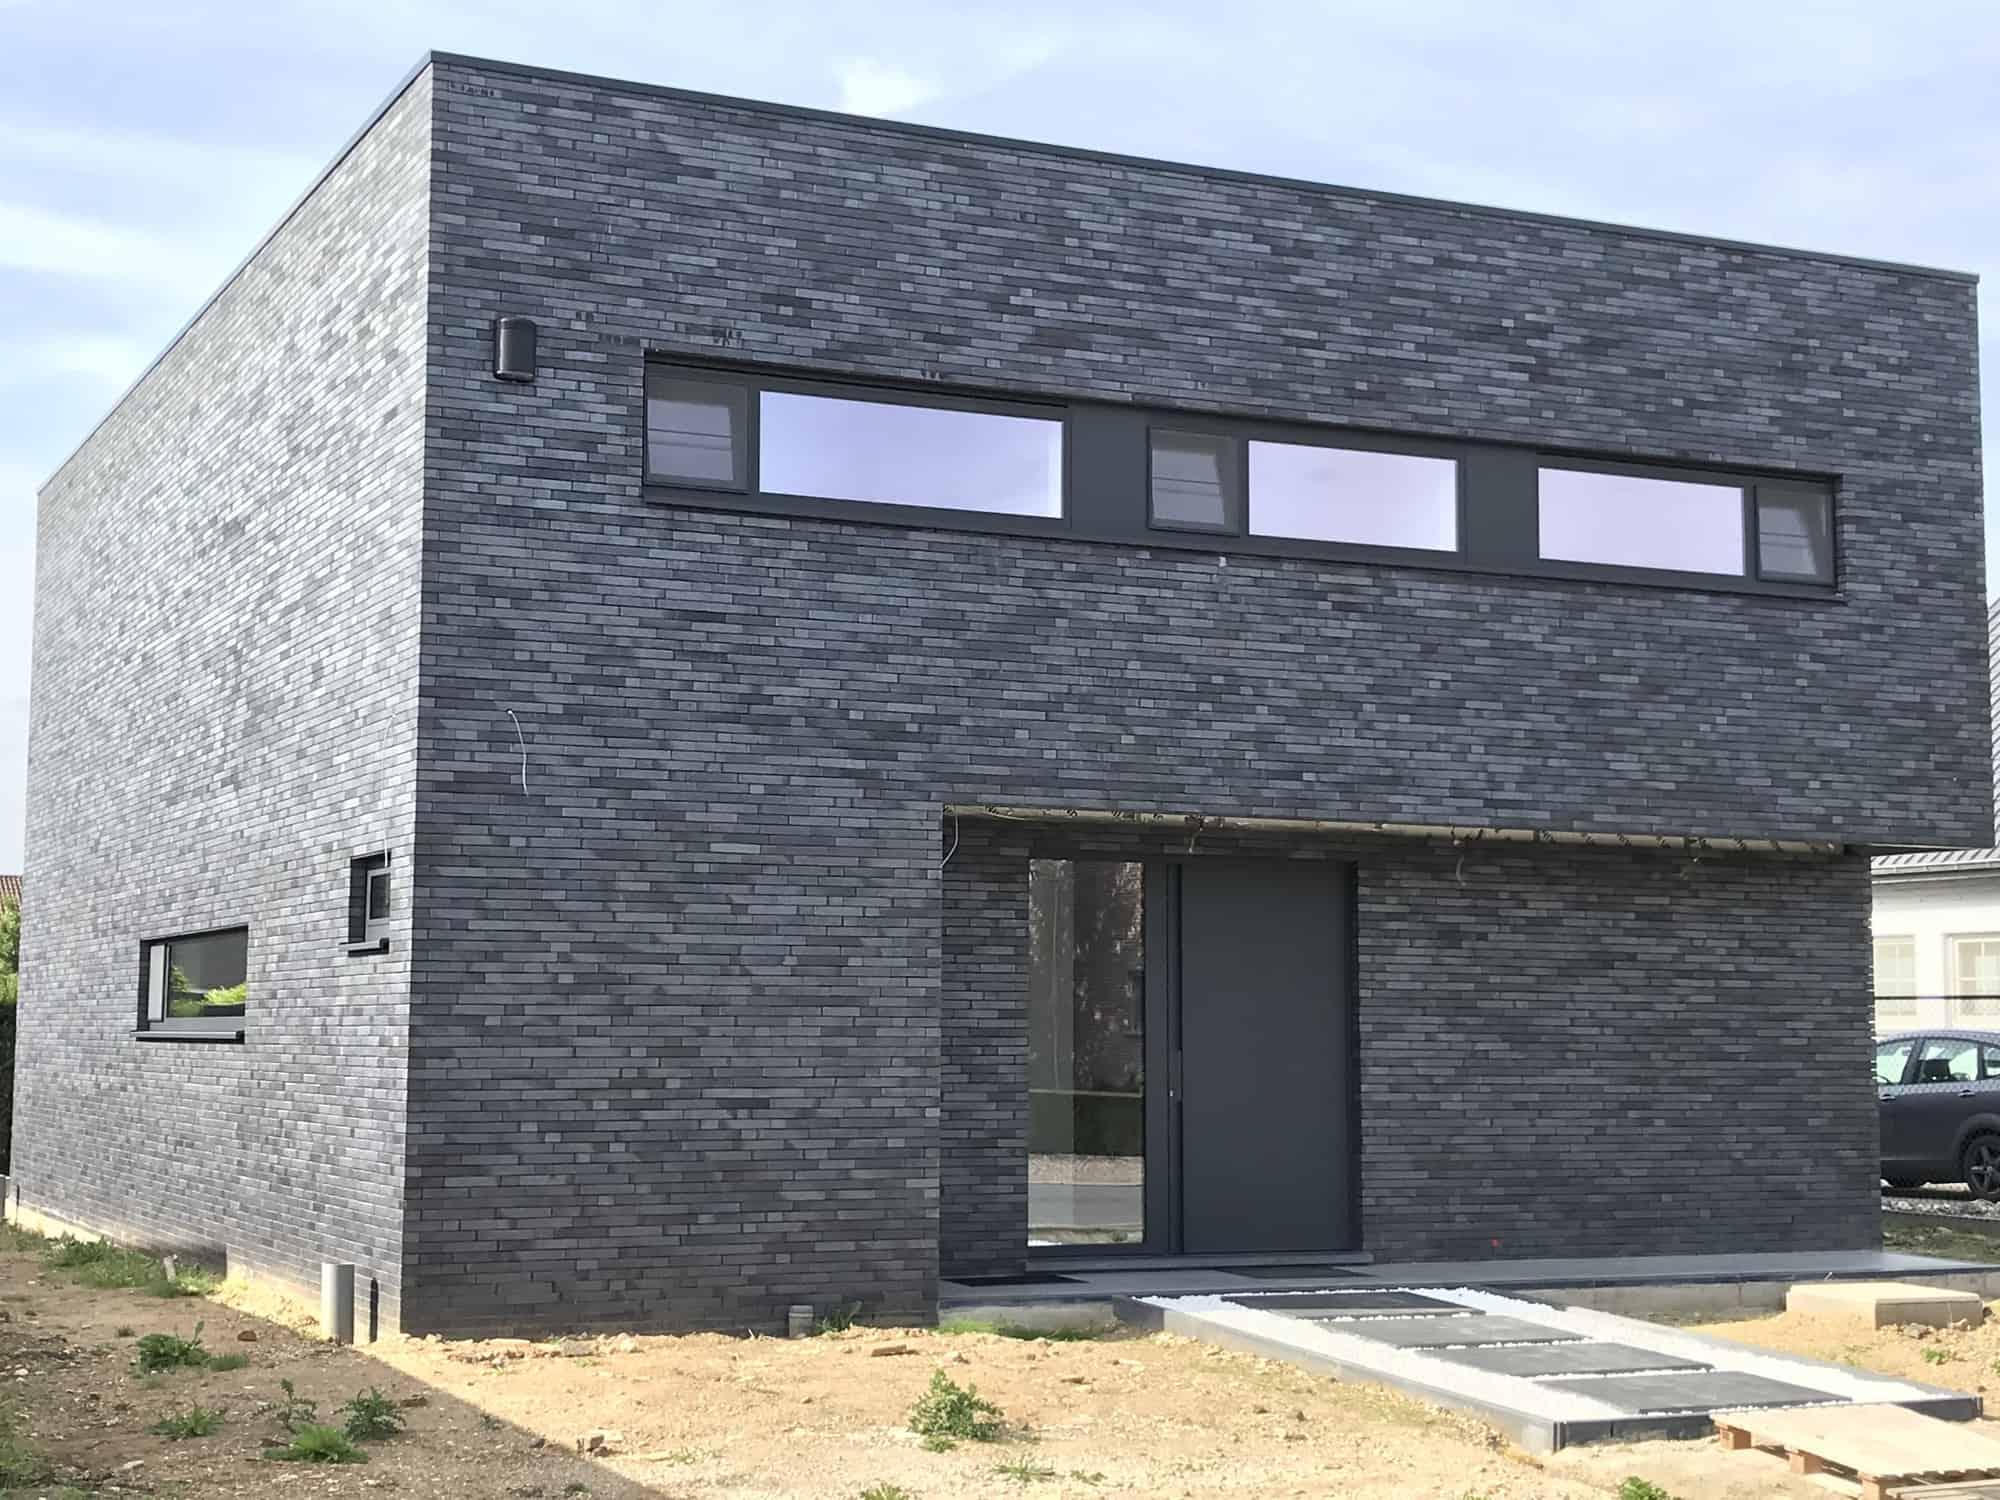 Detail afbeelding 3 van VM   –    Strakke Gezinswoning    –   Maasmechelen | Ontwerp door architect Patrick Strackx